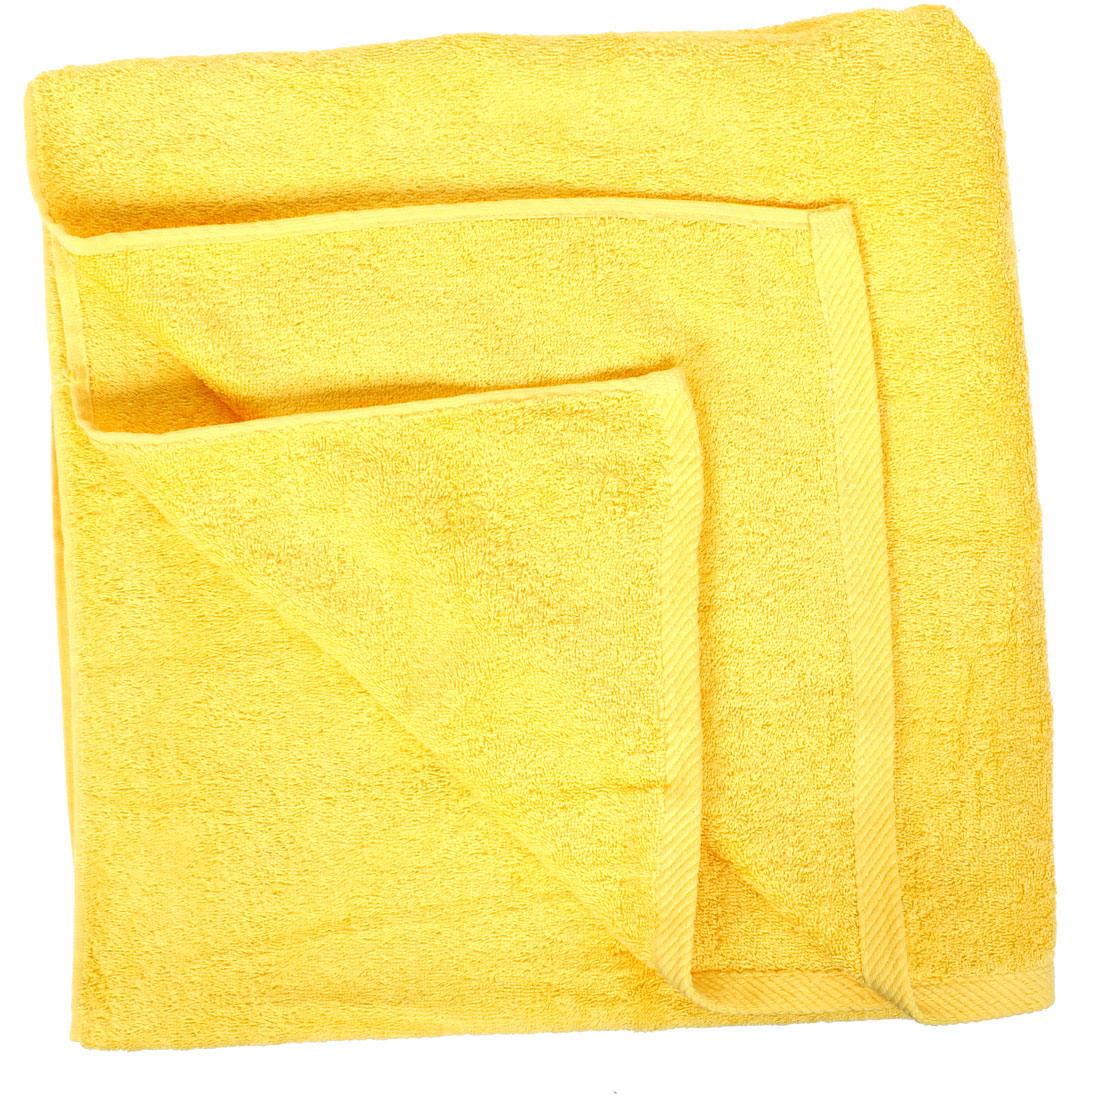 Cotton Blend Gym Beach Shower Bath Towel Sheet Washcloth Yellow 160 x 80cm